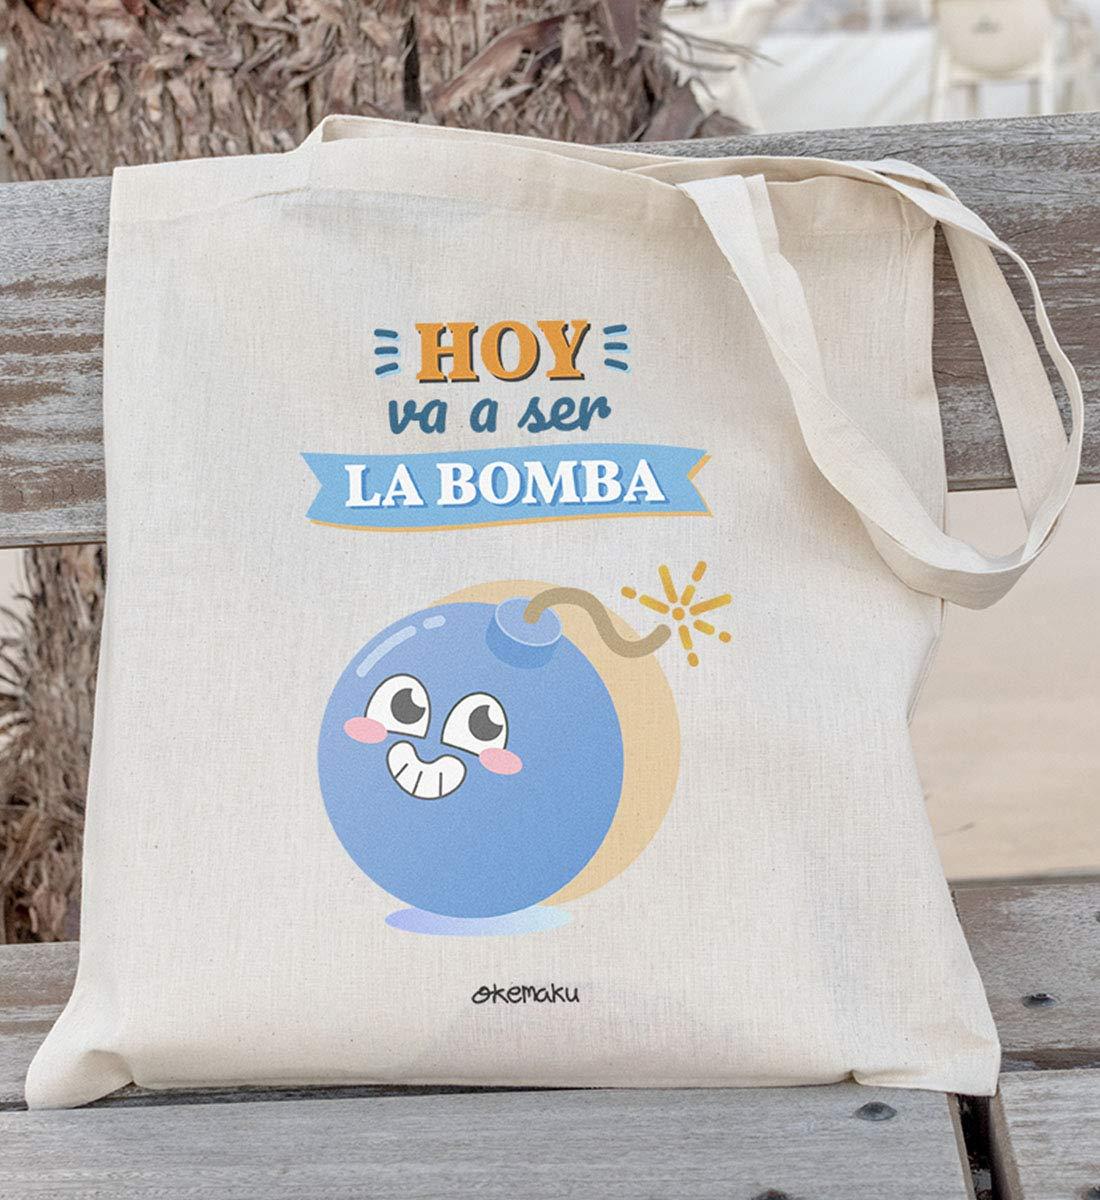 Okemaku - Tote Bag Mensaje: Hoy va a ser la Bomba - Bolsa ...